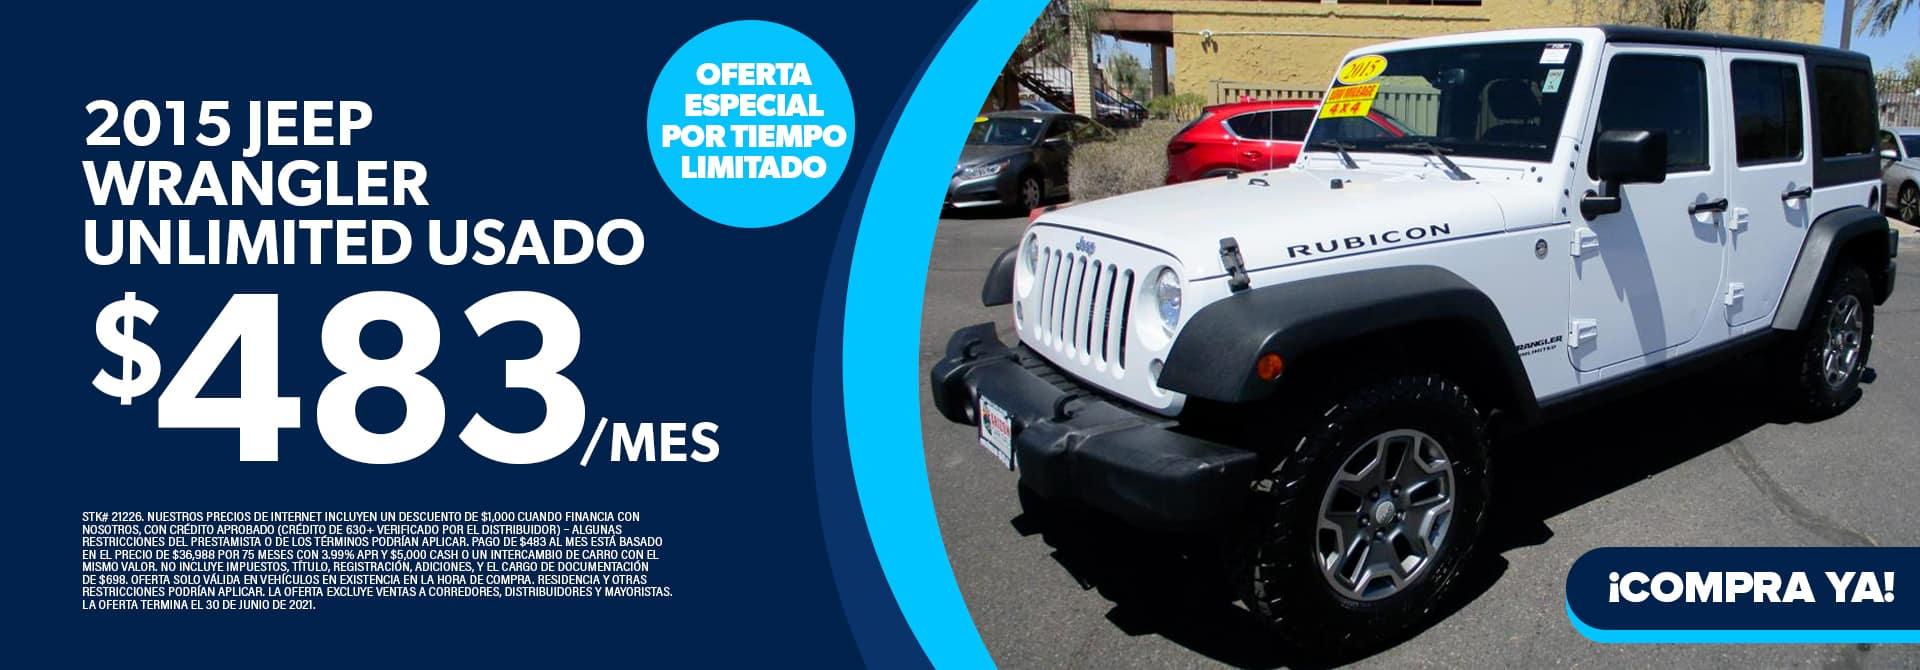 2015 Jeep Wrangler Unlimited Usado